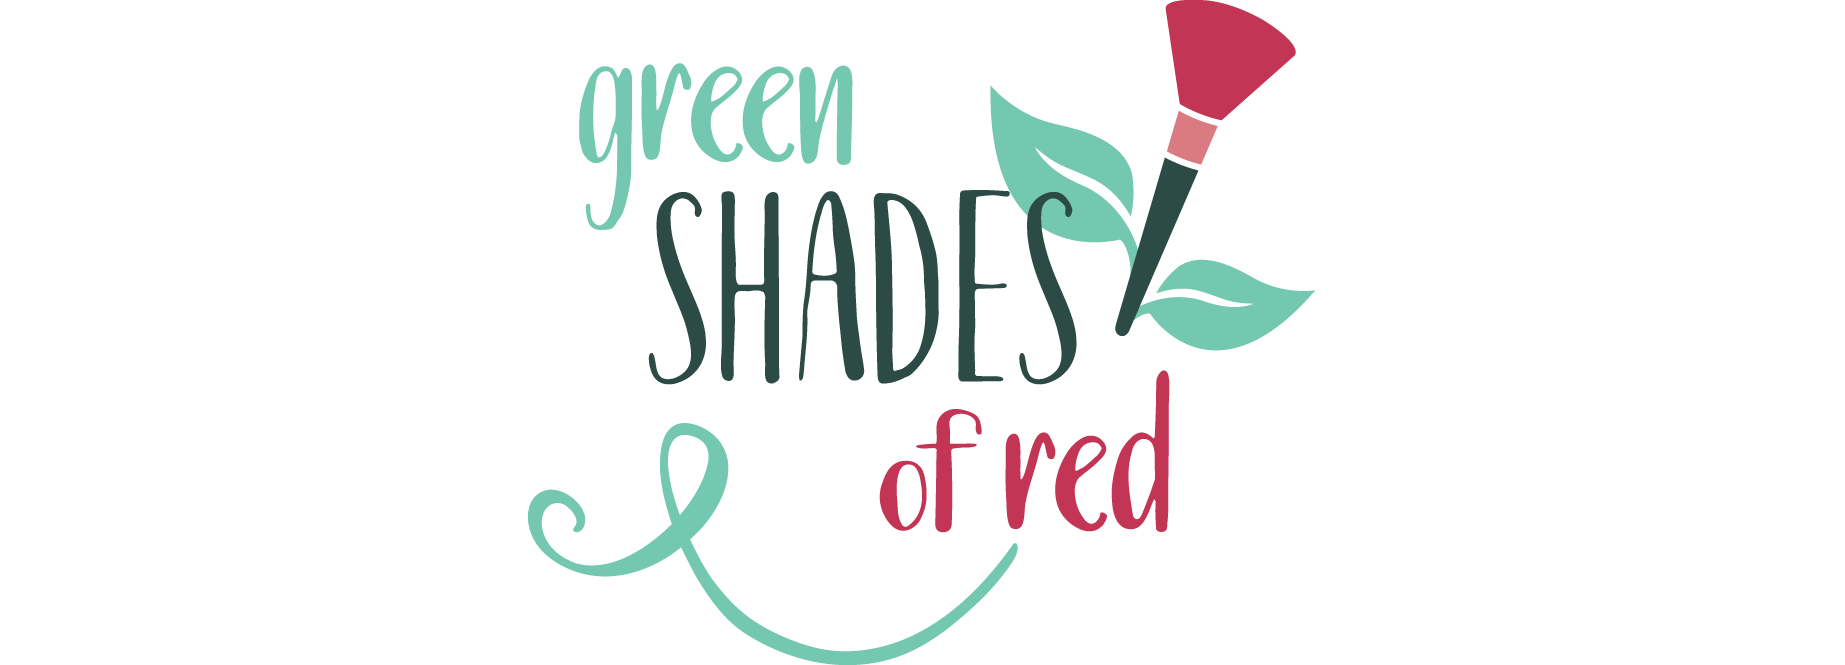 Green Shades of Red - Naturkosmetik & grünes Leben